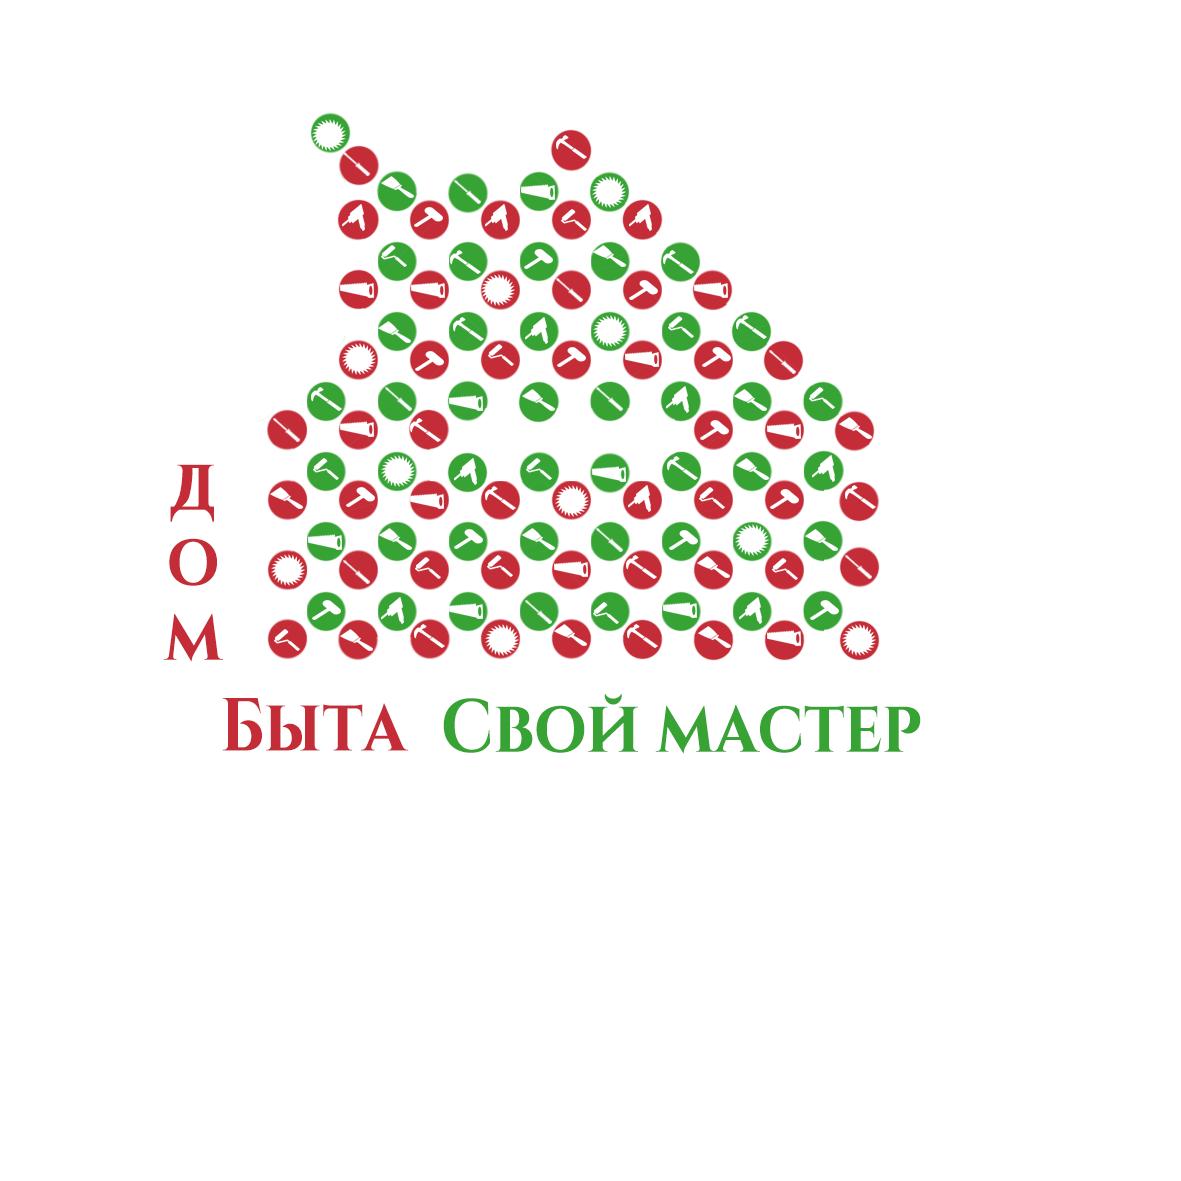 Логотип для сетевого ДОМ БЫТА фото f_3675d7a4e347f9db.png